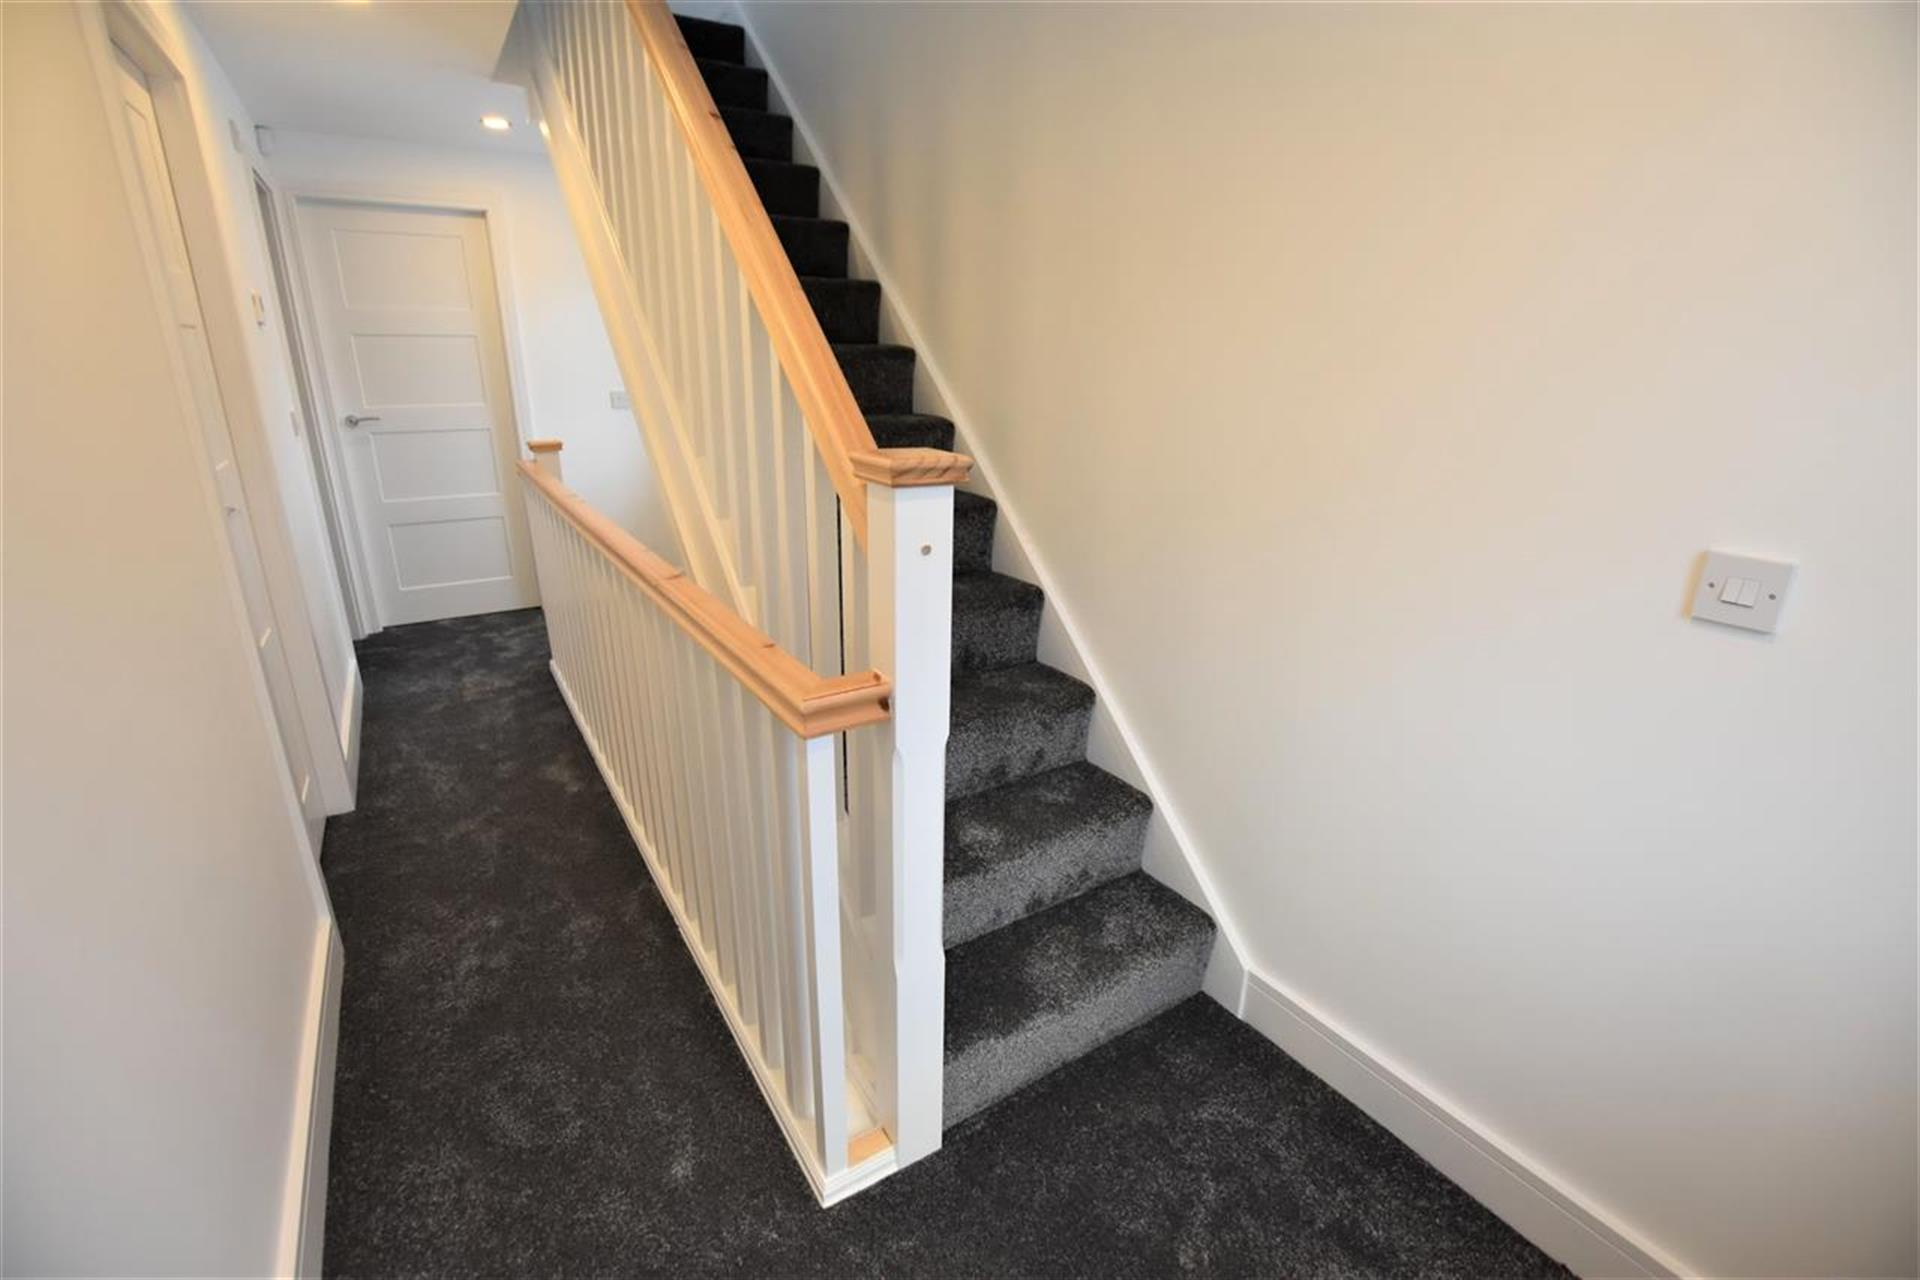 3 Bedroom House For Sale - Hallway to Third Floor